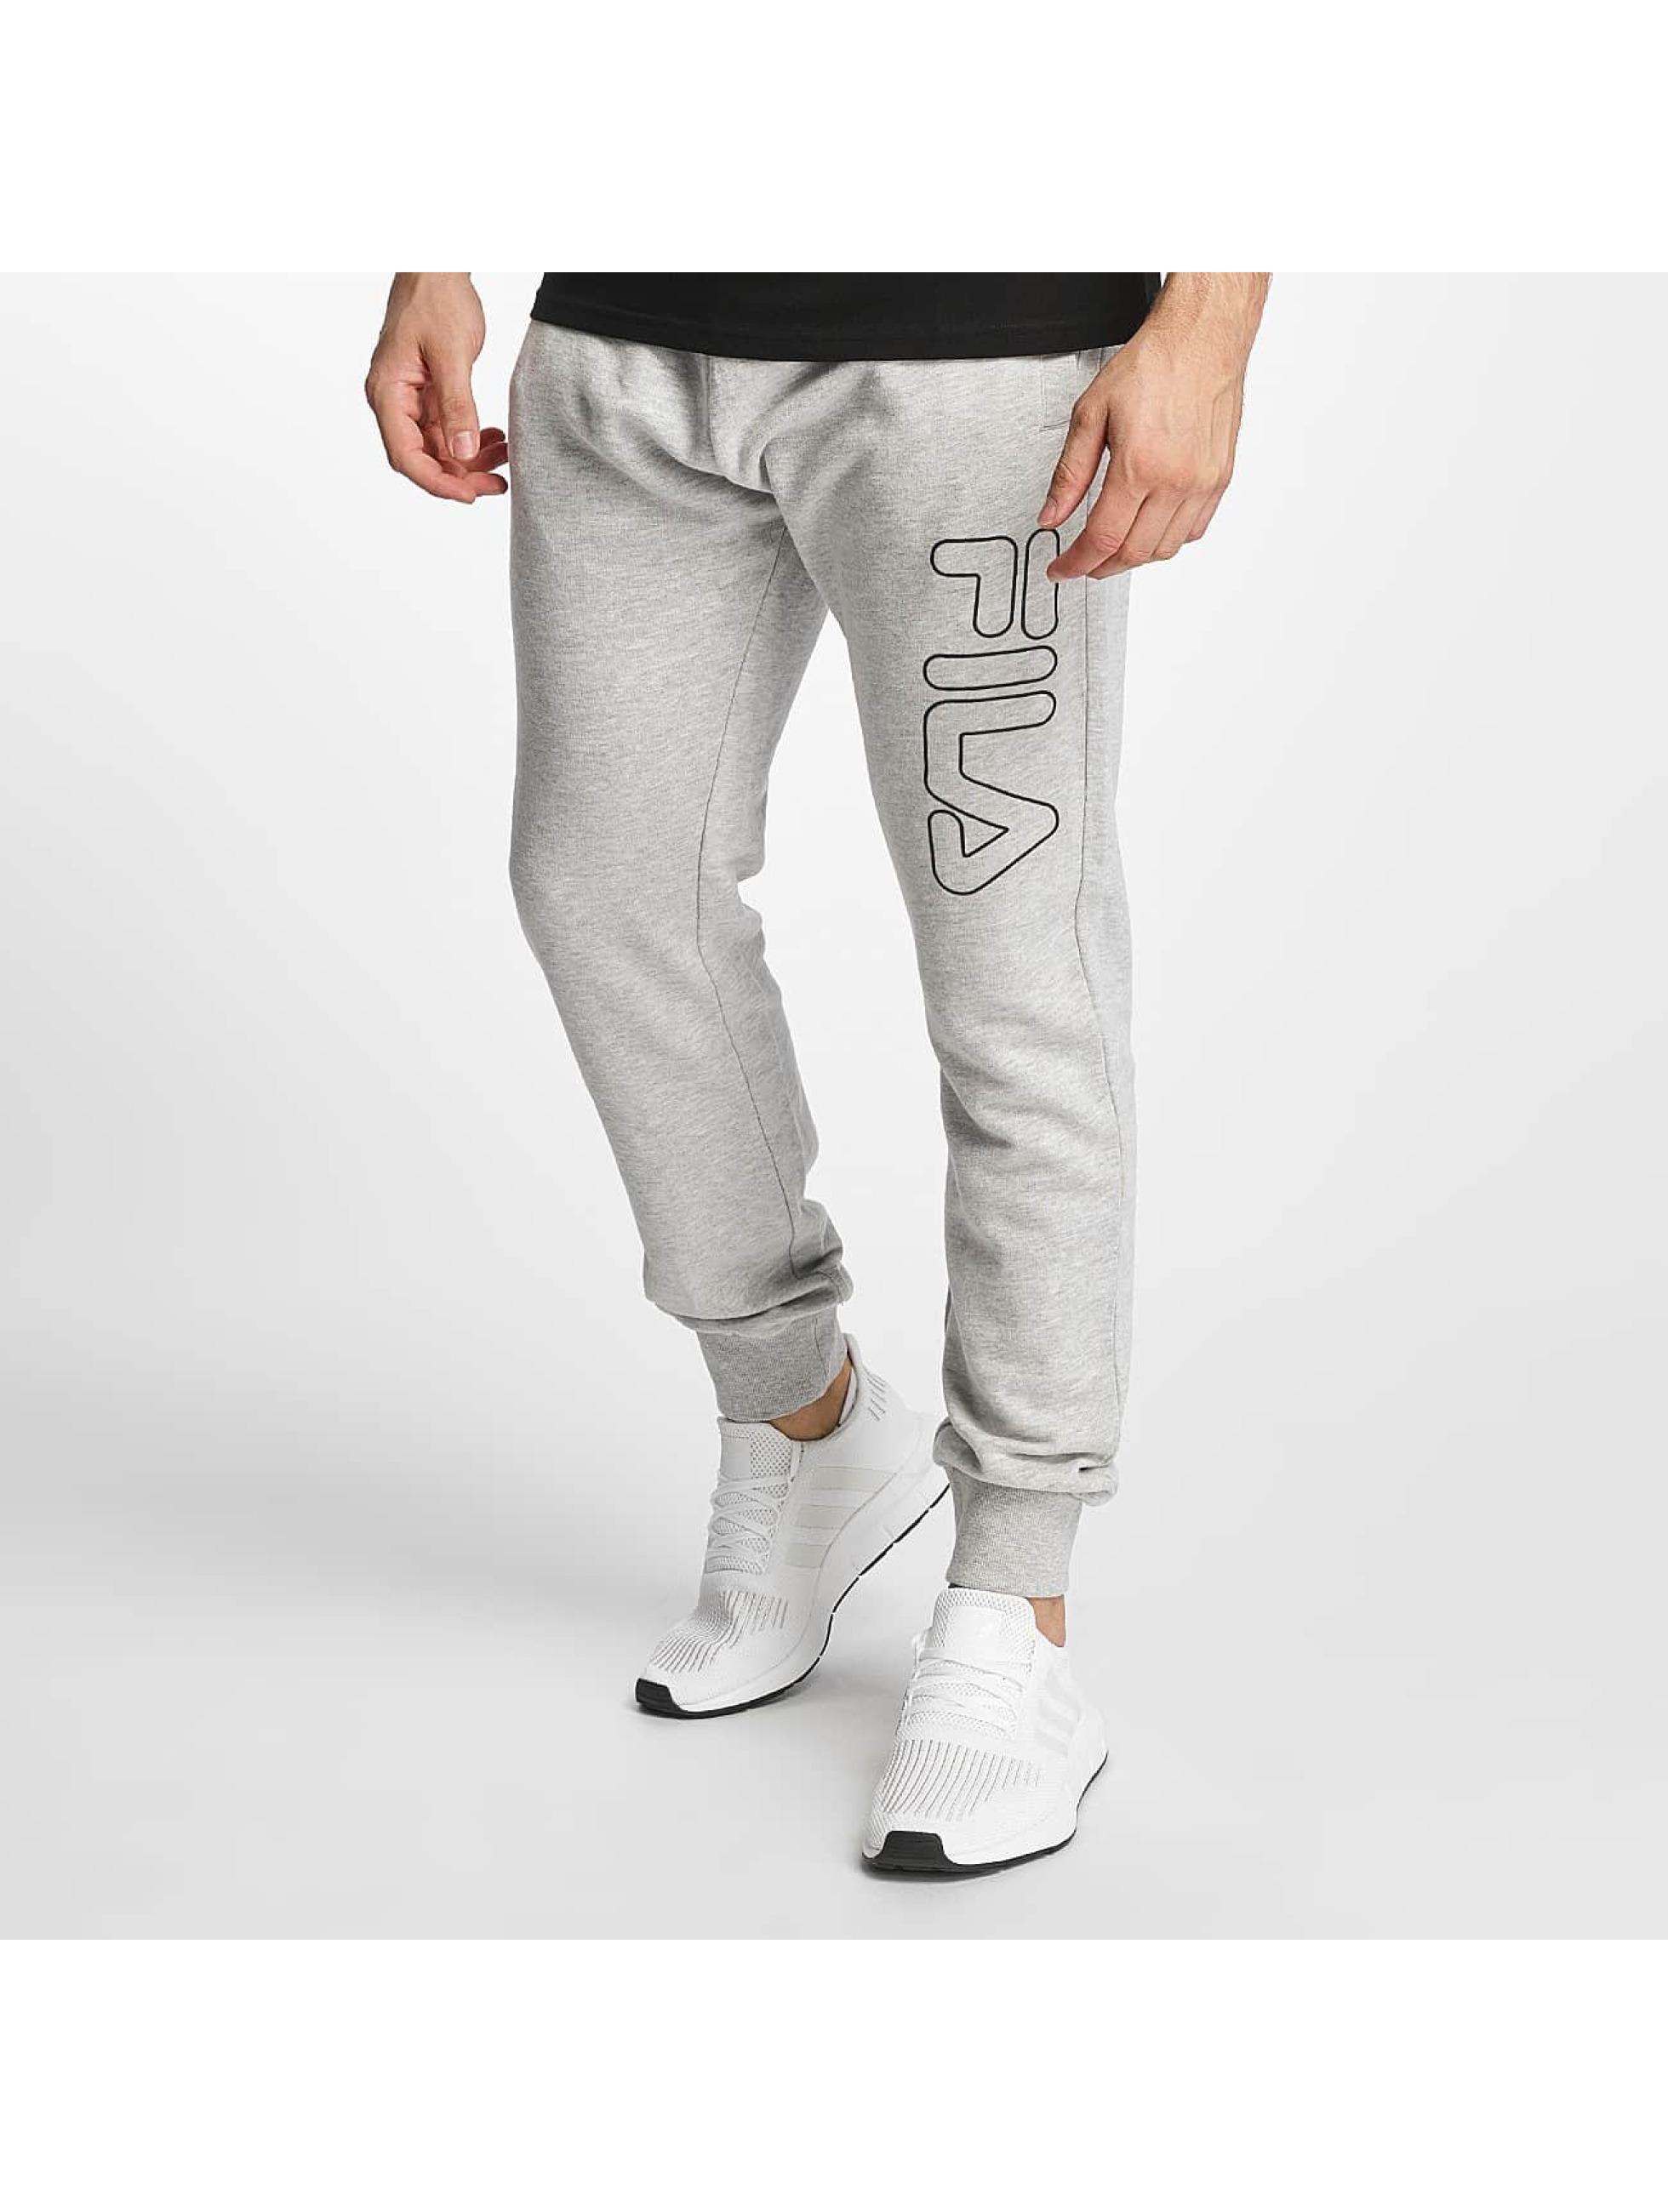 FILA Spodnie do joggingu Core Line szary